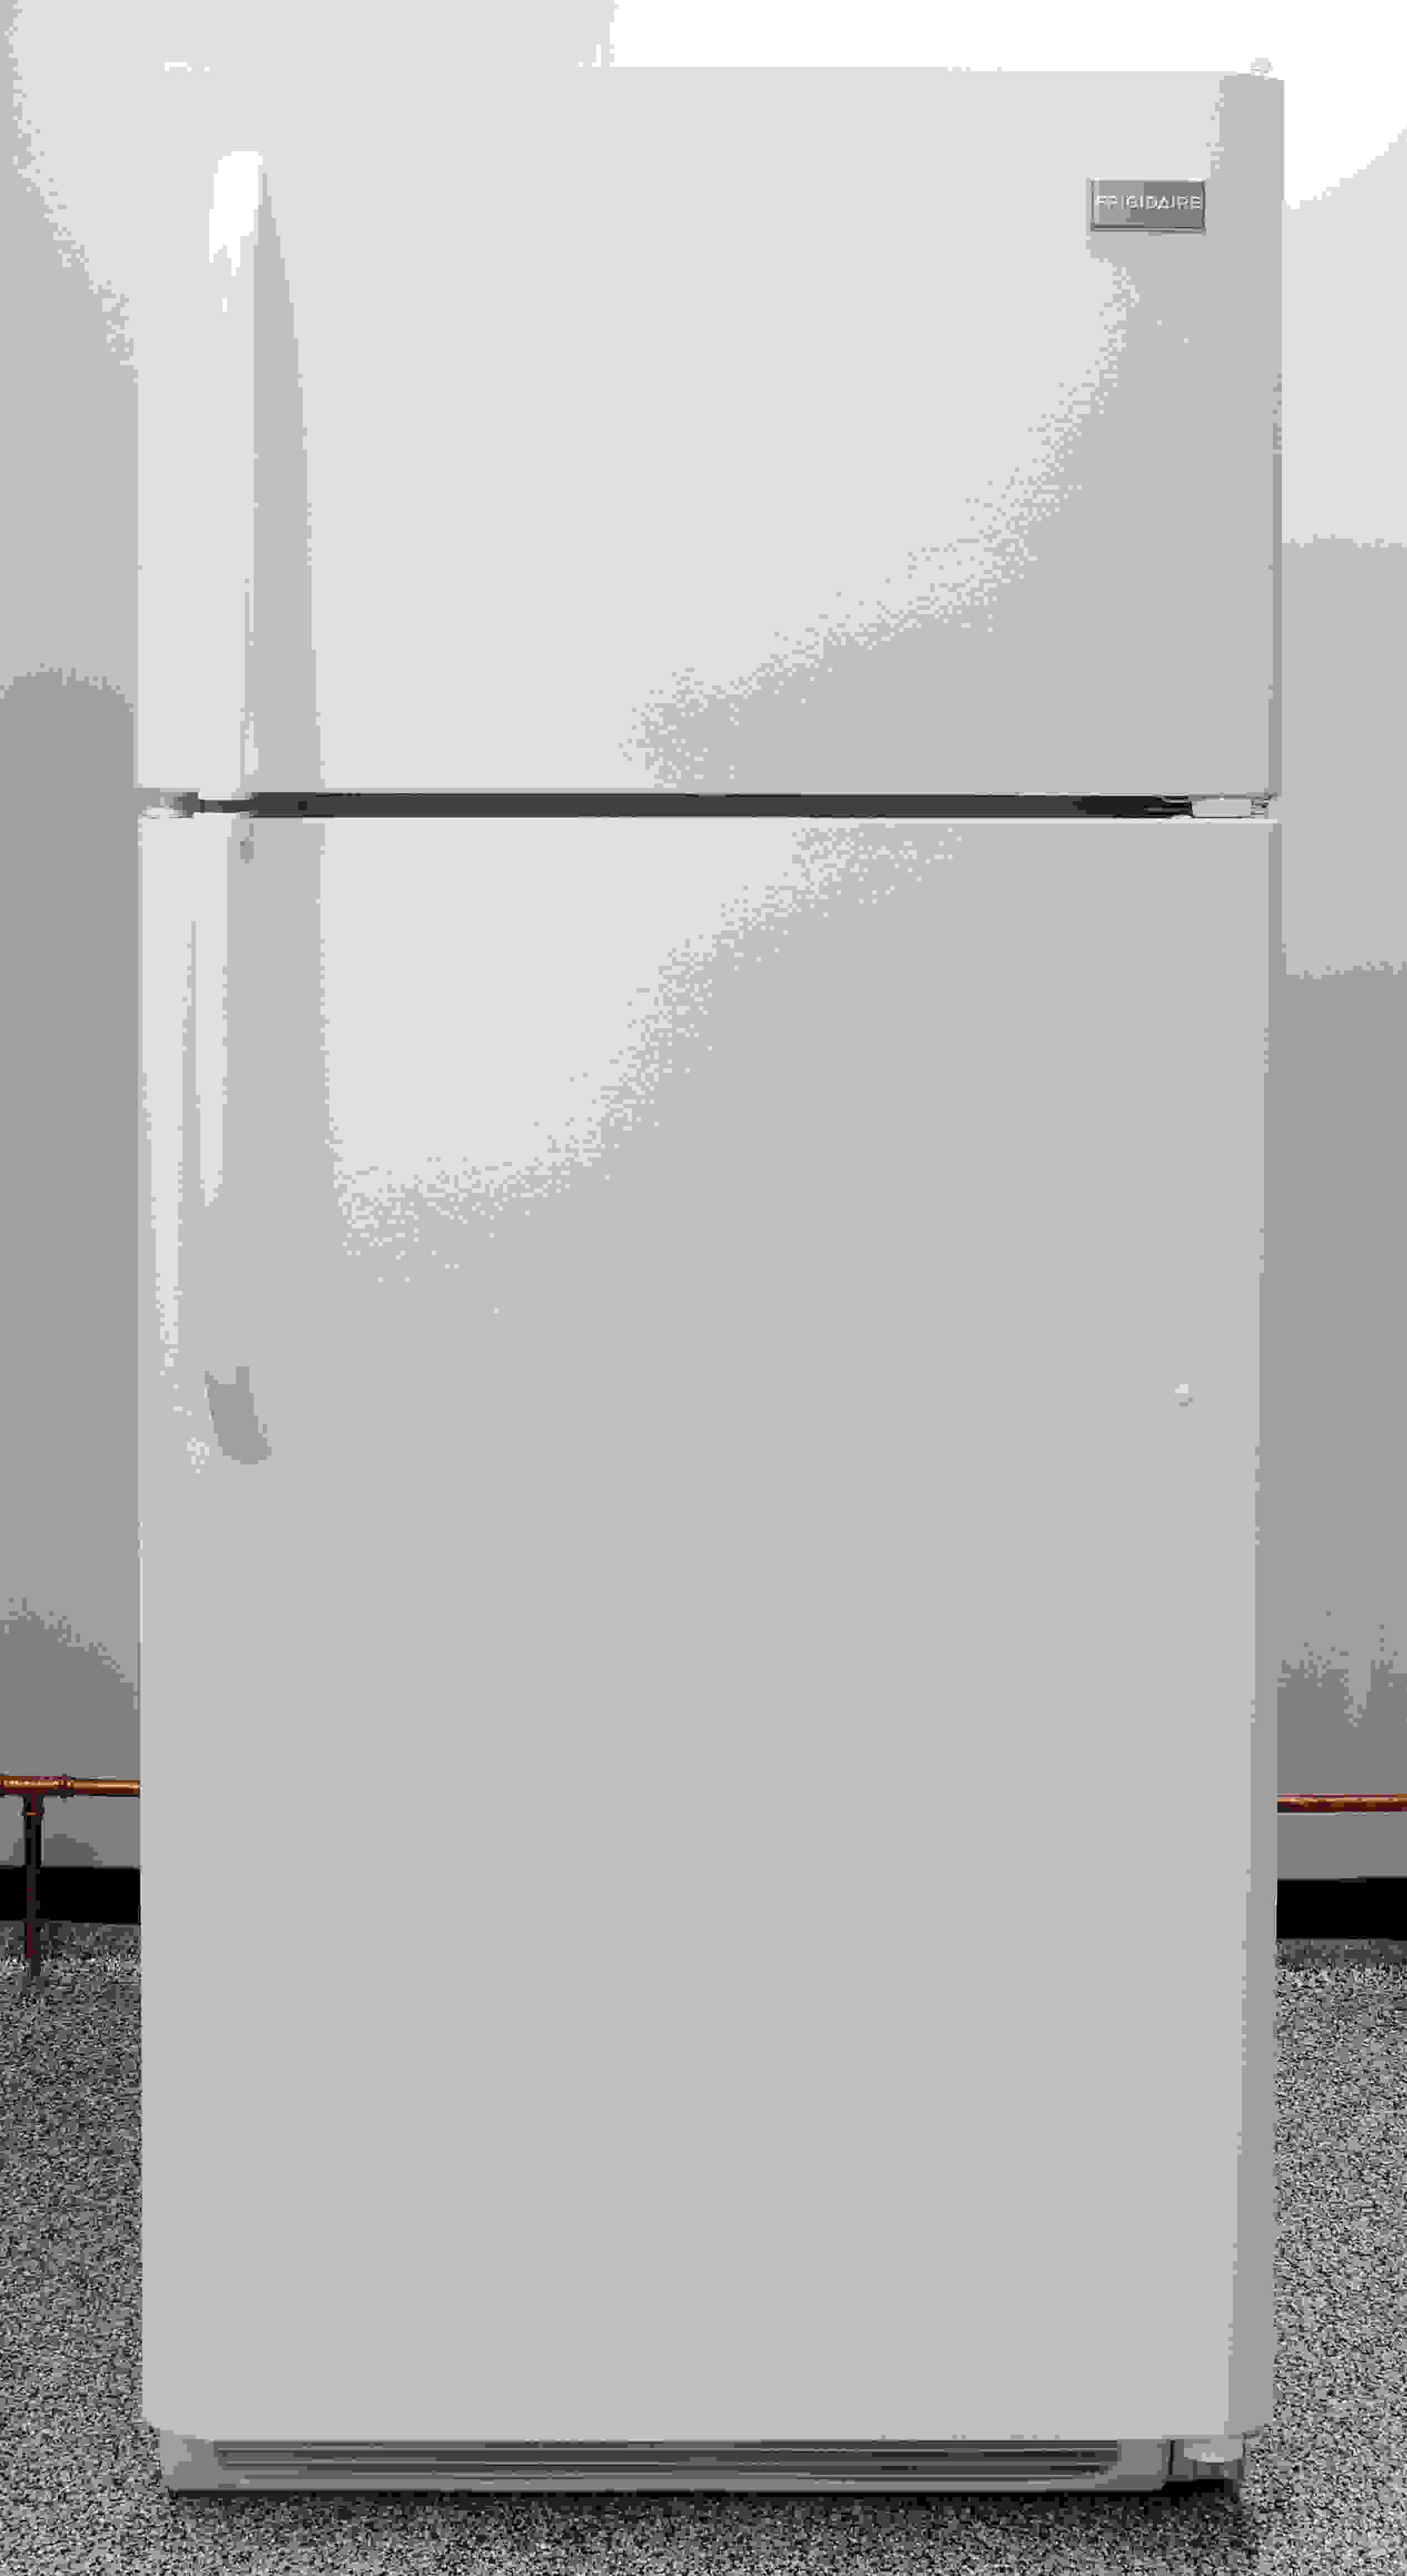 The Frigidaire FFTR1814QW is a basic 18-cubic-foot top freezer.